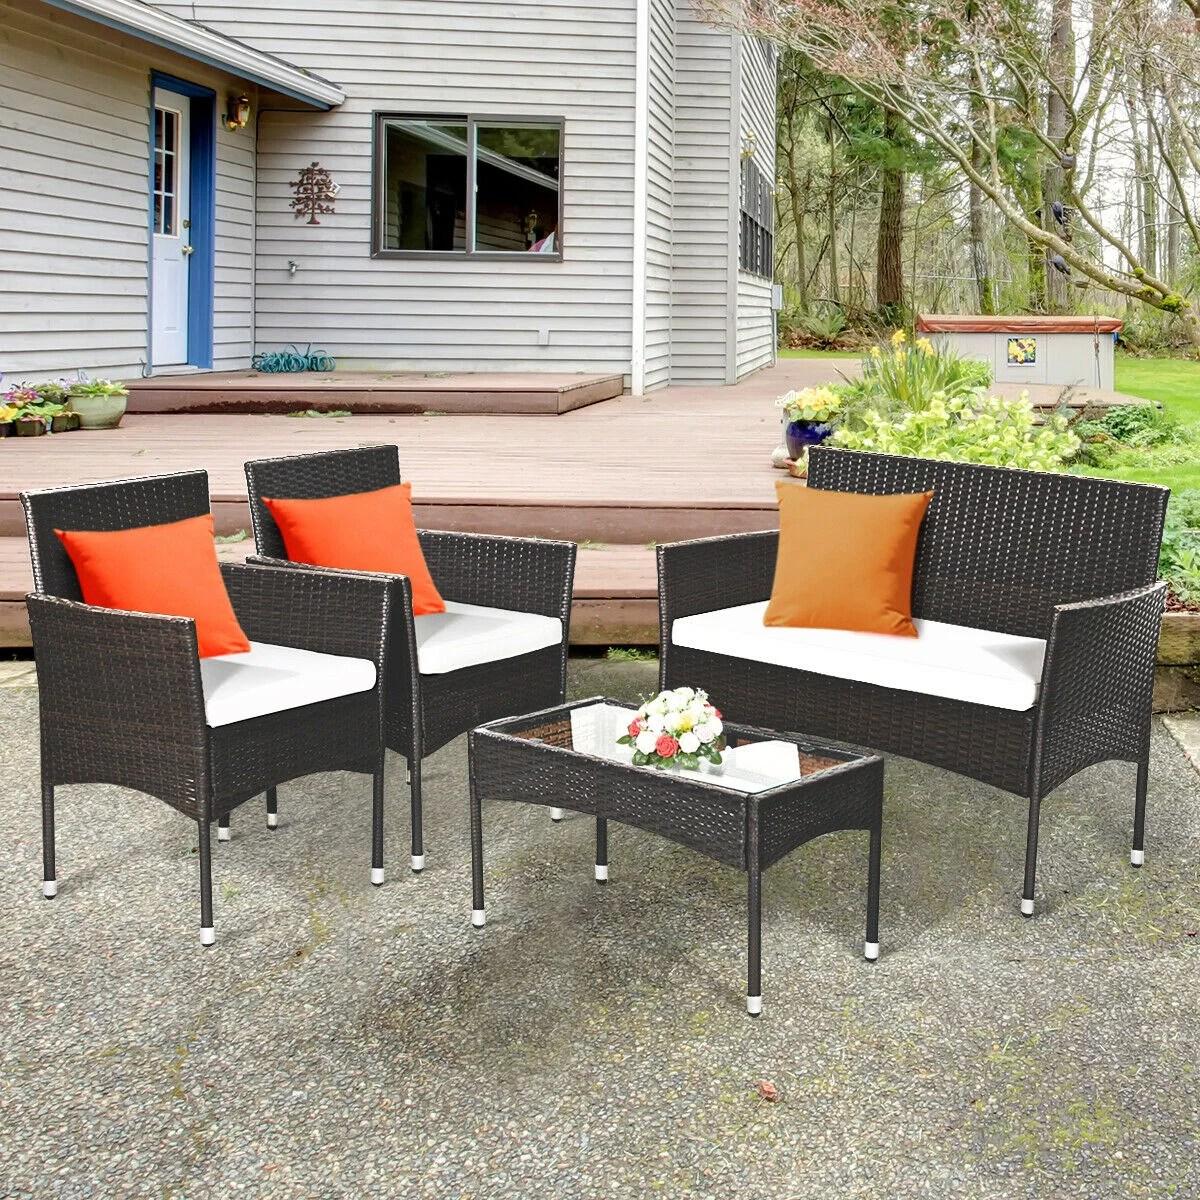 gymax set of 4 rattan wicker furniture